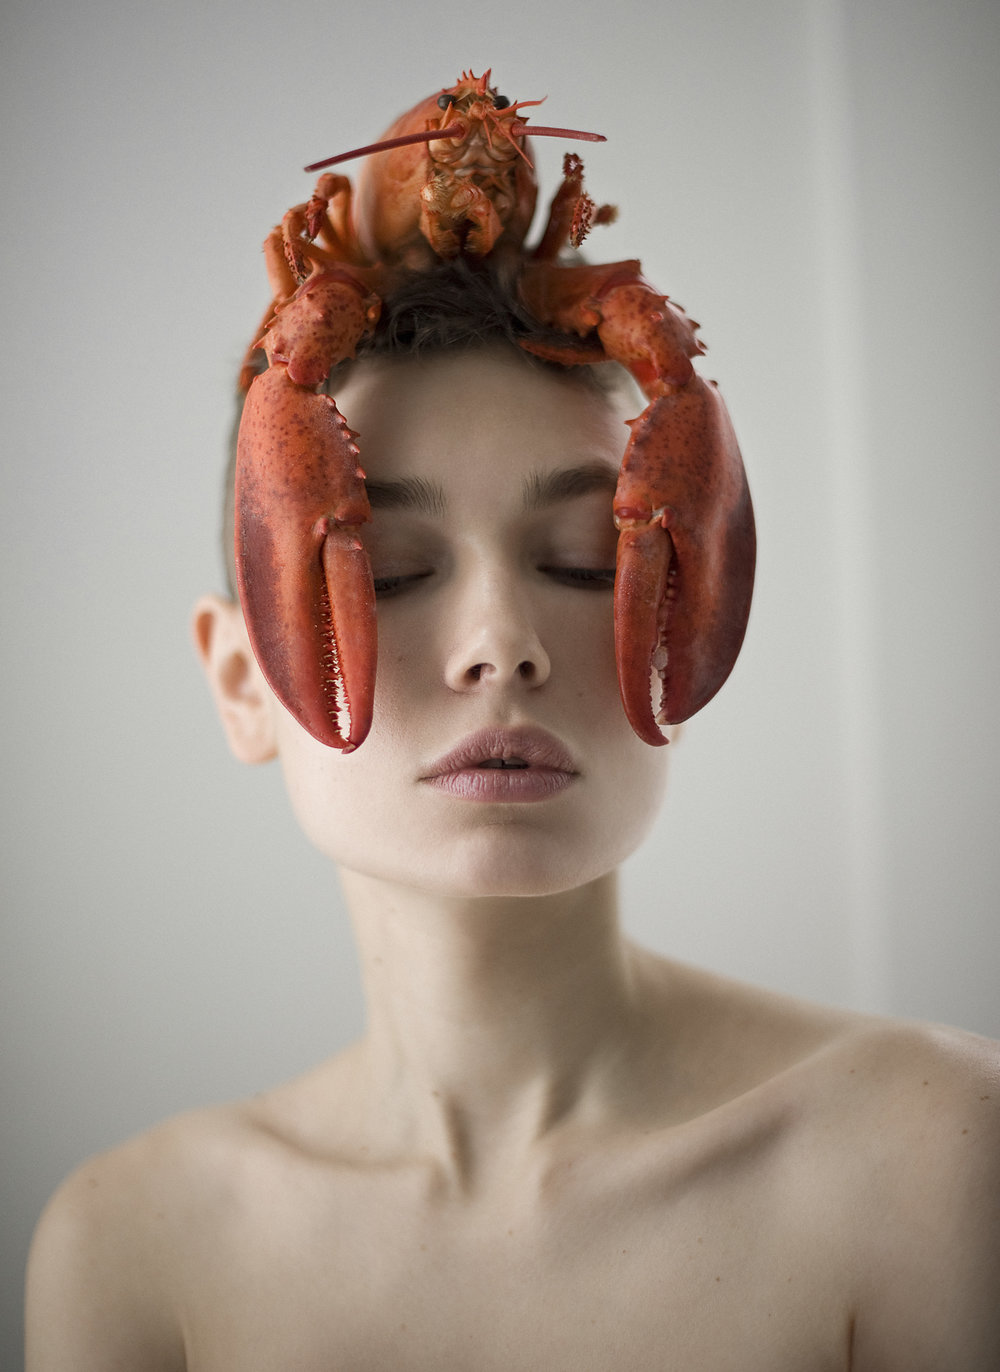 octopus-339 copy.jpg